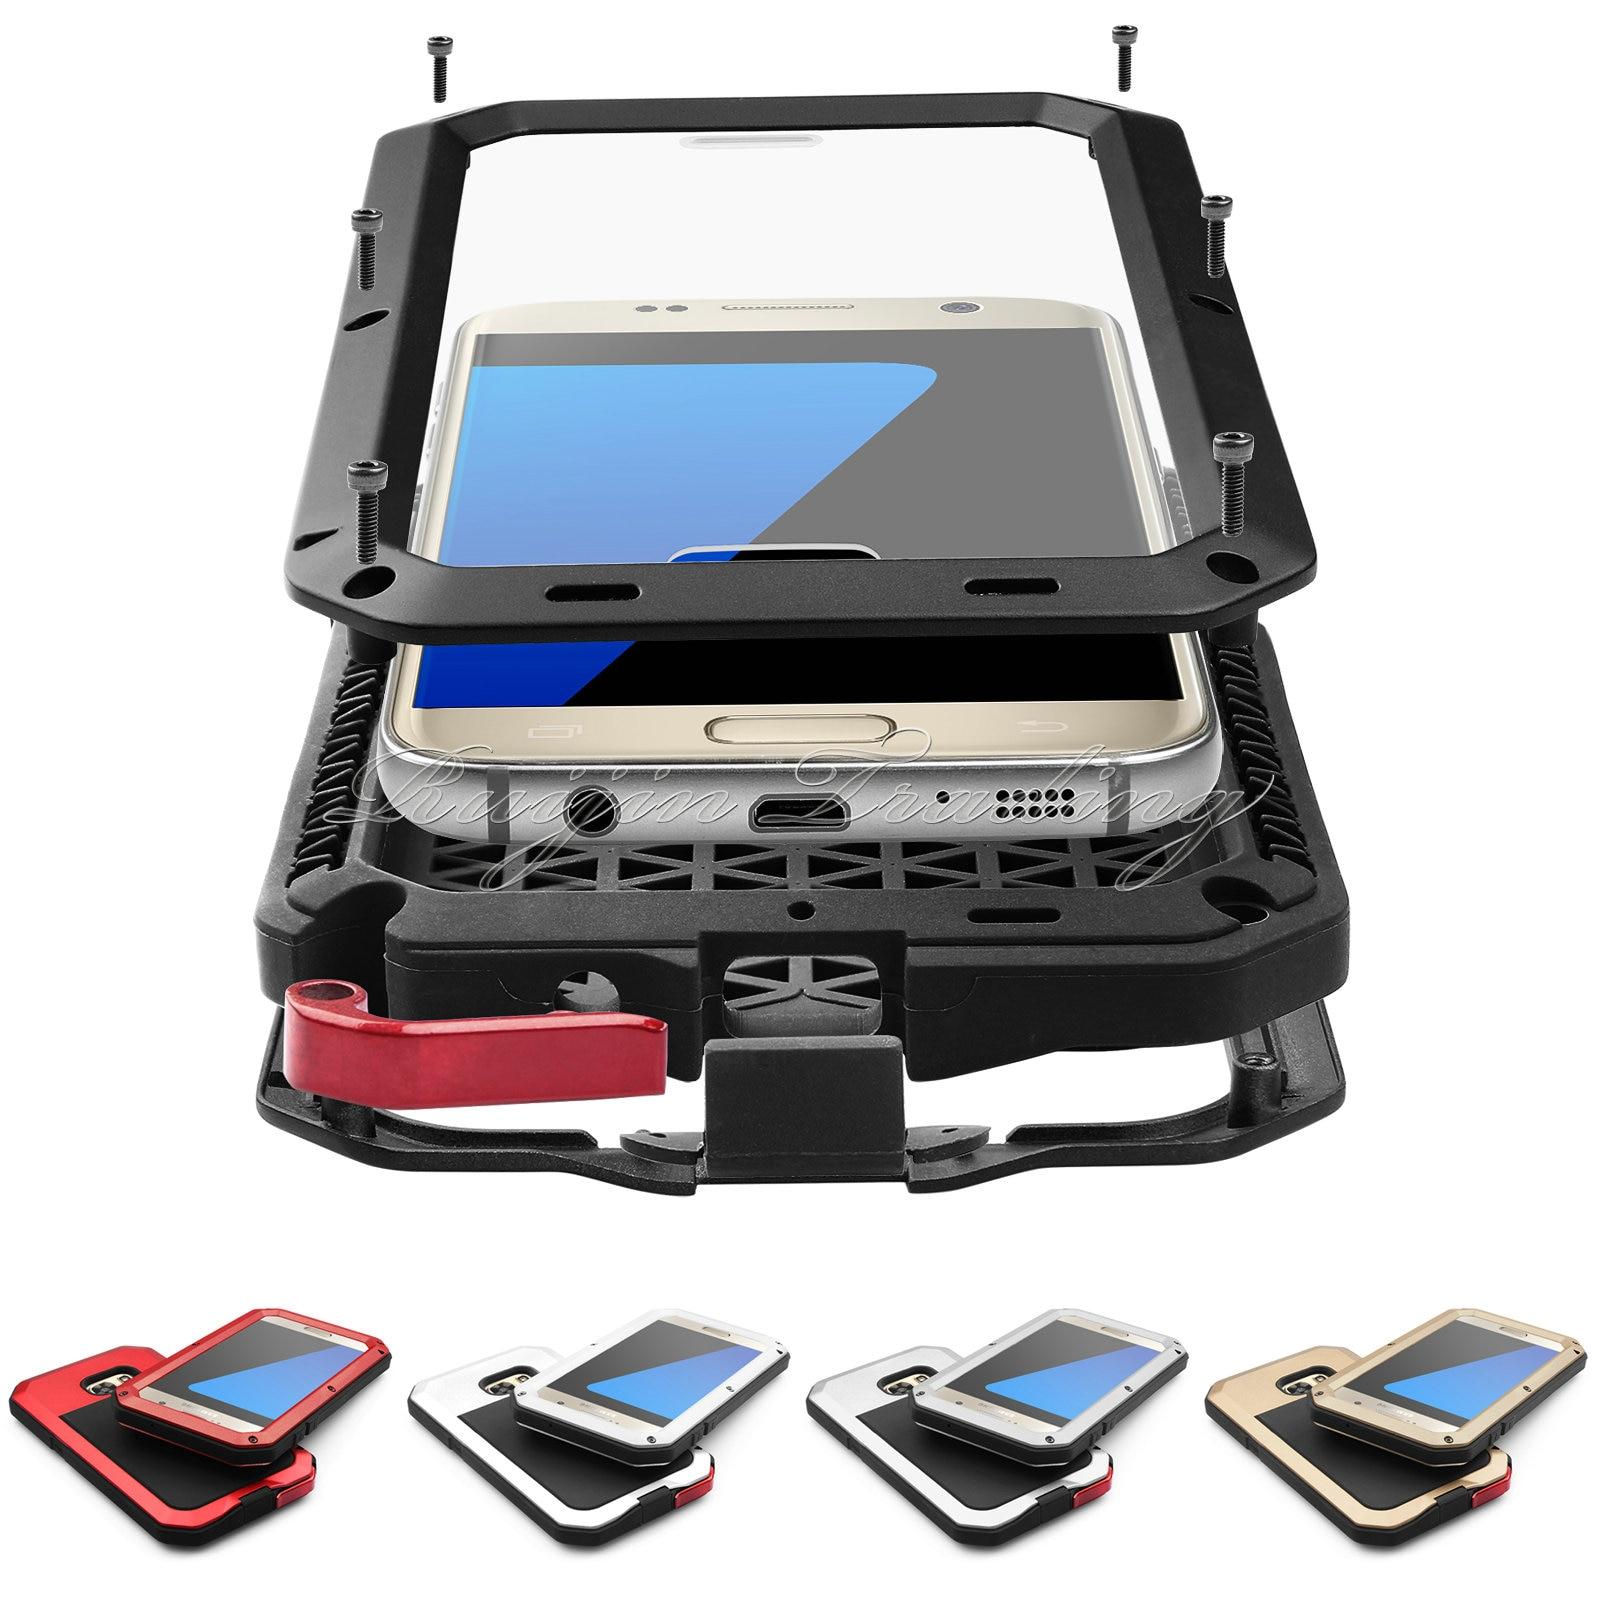 imágenes para A prueba de golpes Para Samsung Galaxy S4 S5 S6 S7 borde nota 4 5 IPX3 Impermeable Potencia Protectora de Aluminio Gorilla Glass cubierta